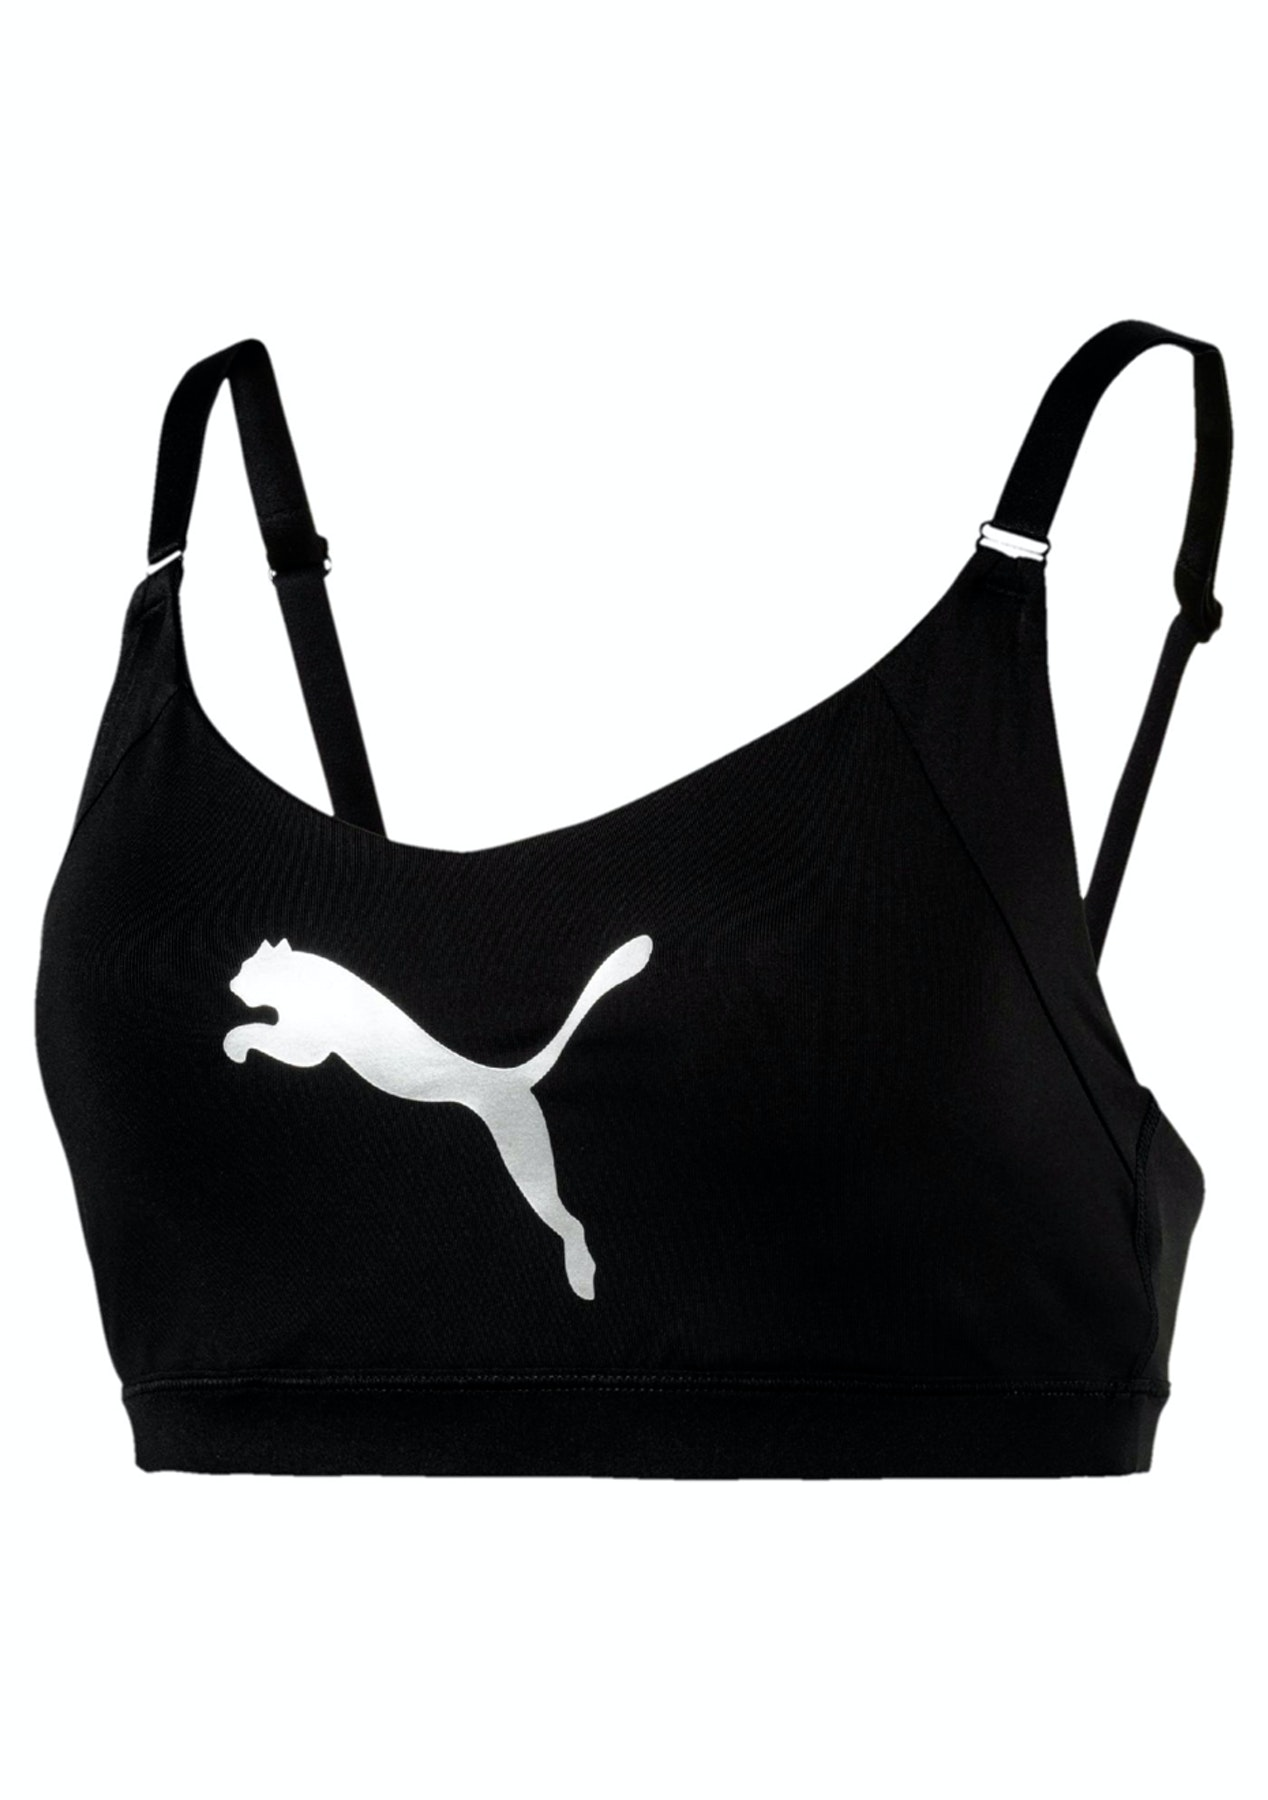 d7c3d0a7b045 Puma Womens - En Pointe Logo Bra - M Black - Puma Womens   Kids up to 63%  Off - Onceit